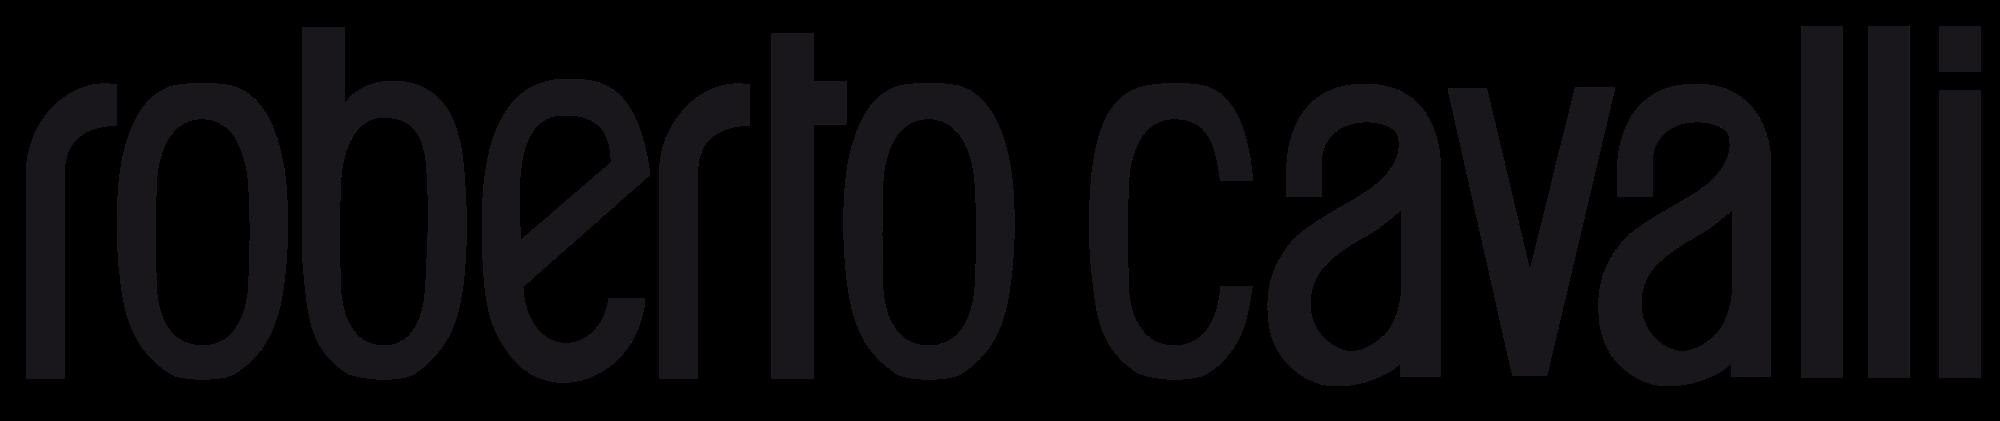 Roberto-Cavalli-Logo_svg